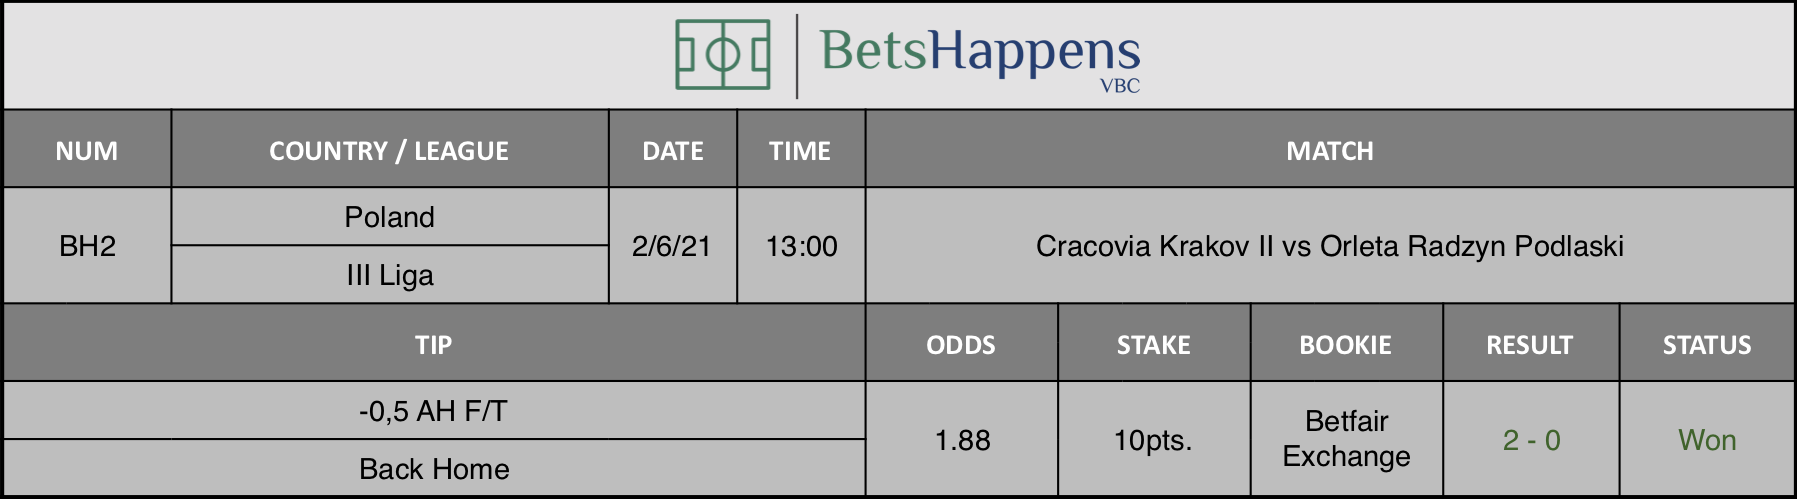 Results of our tip for the Cracovia Krakov II vs Orlęta Radzyn Podlaski where -0,5 AH F/T Back Home is recommended.